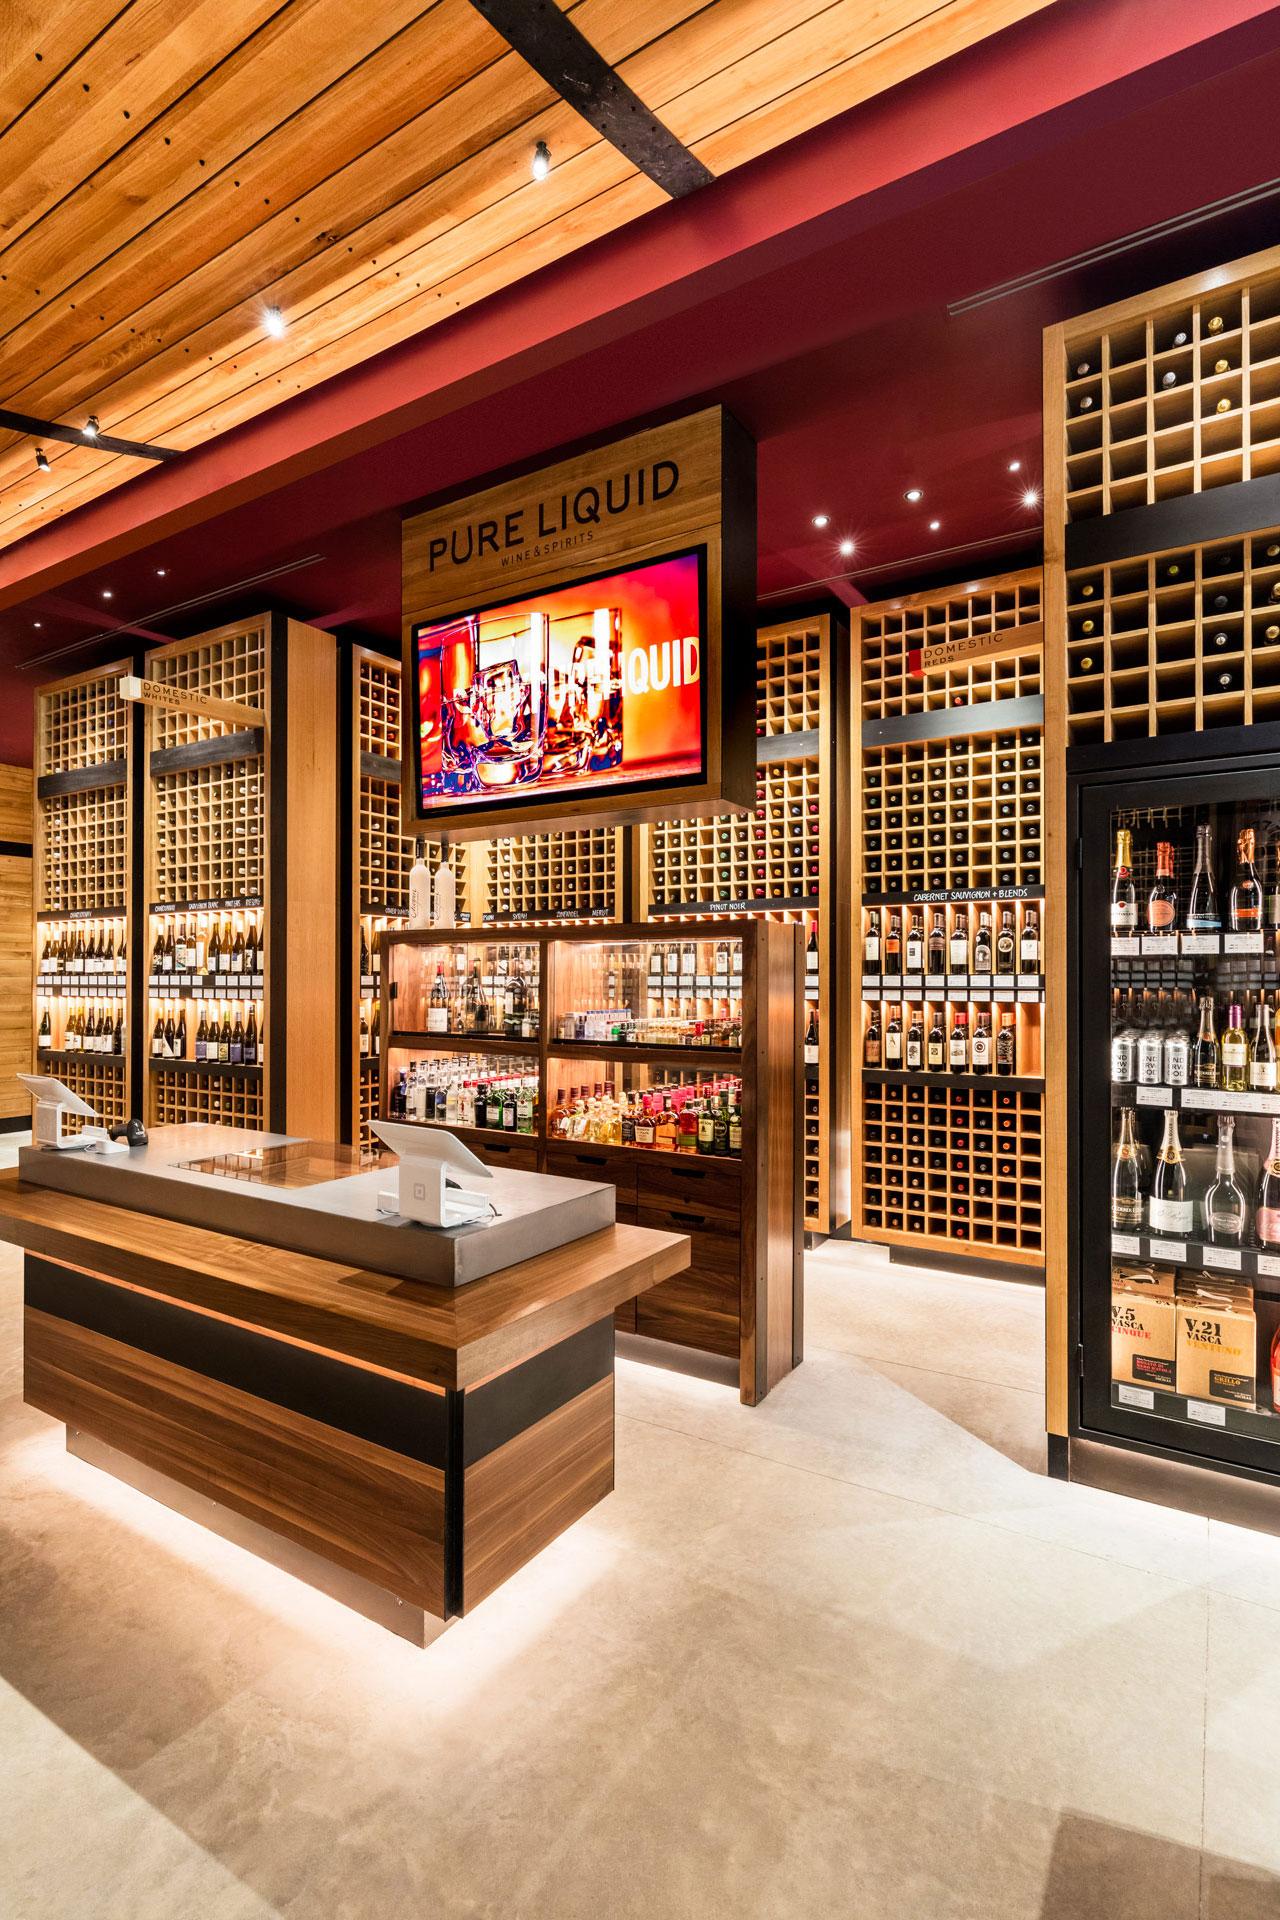 Pure Liquid Wine & Spirits retail store home decor